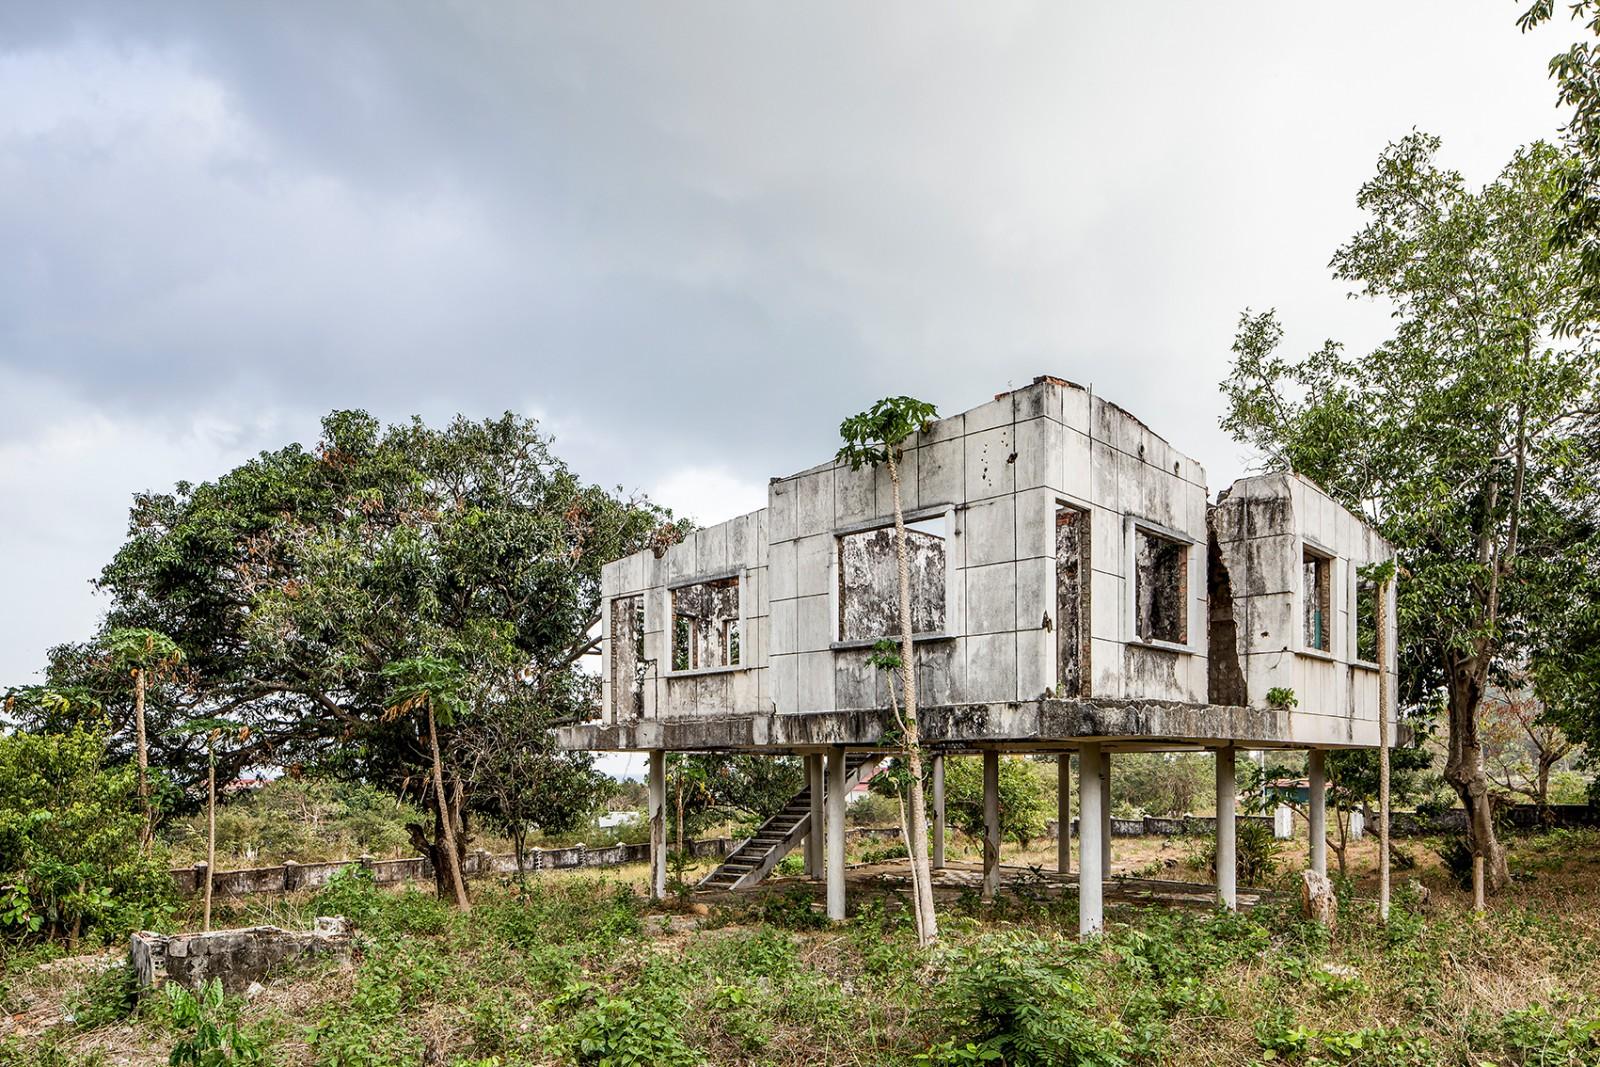 kep-sur-mer - 03 - cambodia von Maximilian Gottwald